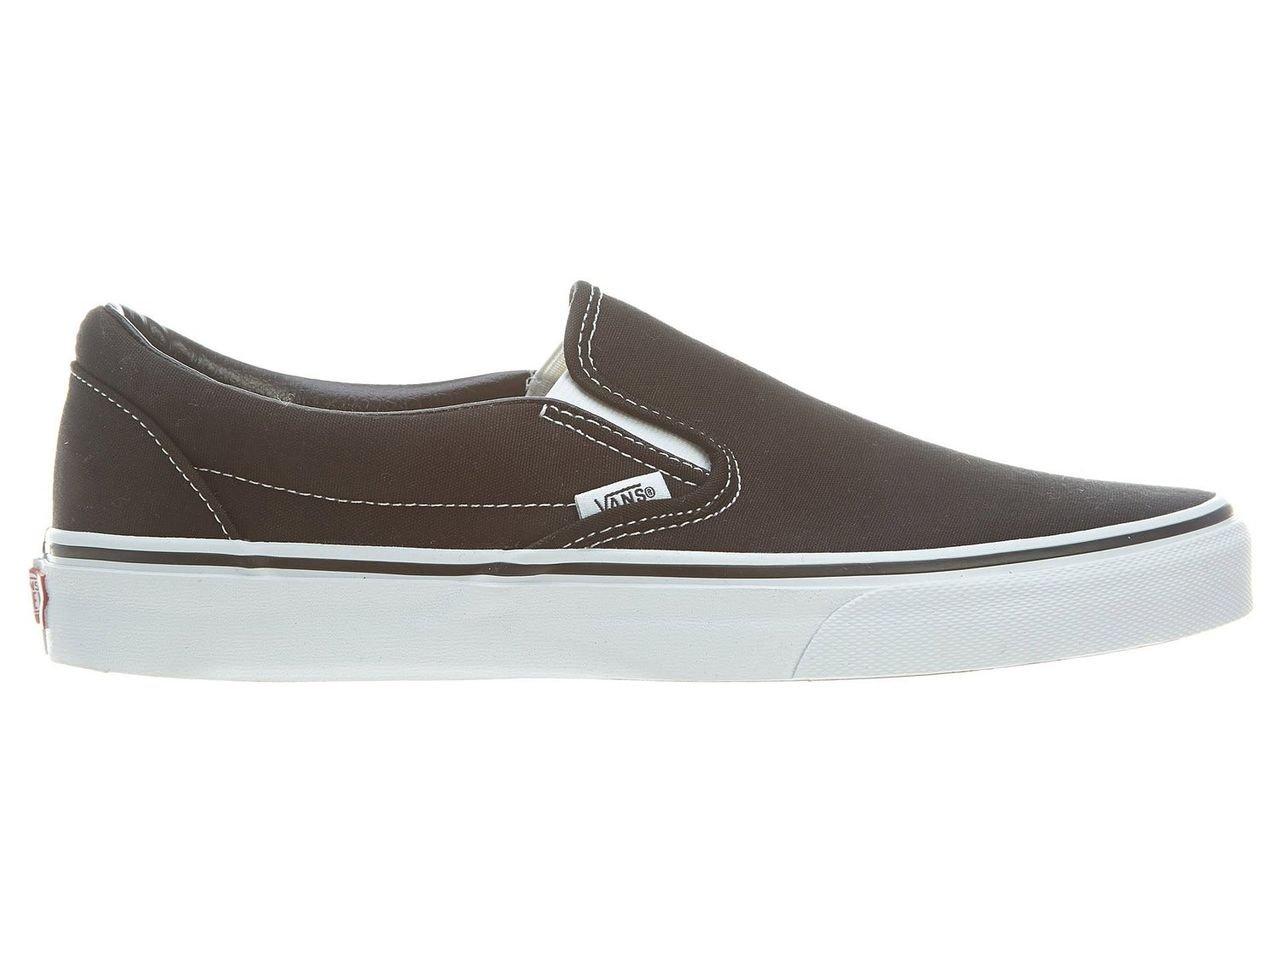 Vans U Classic Slip-On Skate Shoe Black 5 D(M) US